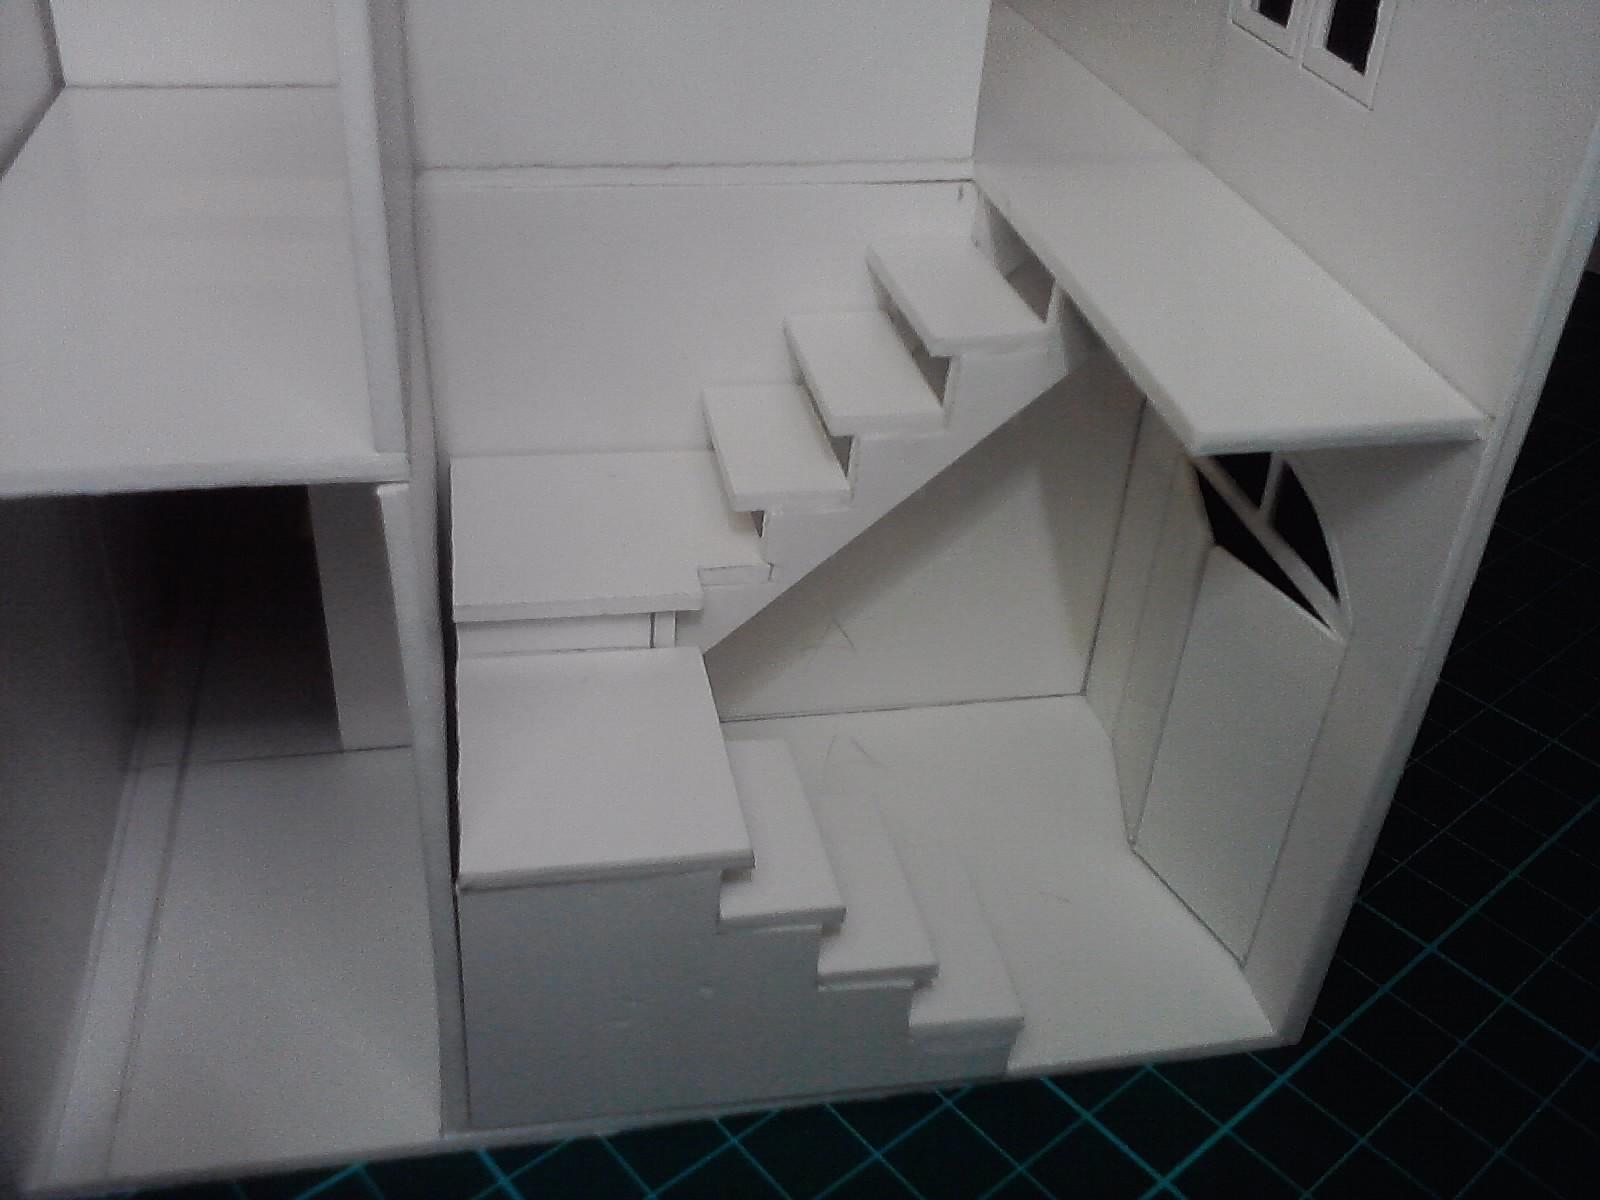 Encobertura escenograf a edificio para miniaturas de 28 - Escalera para buhardilla ...